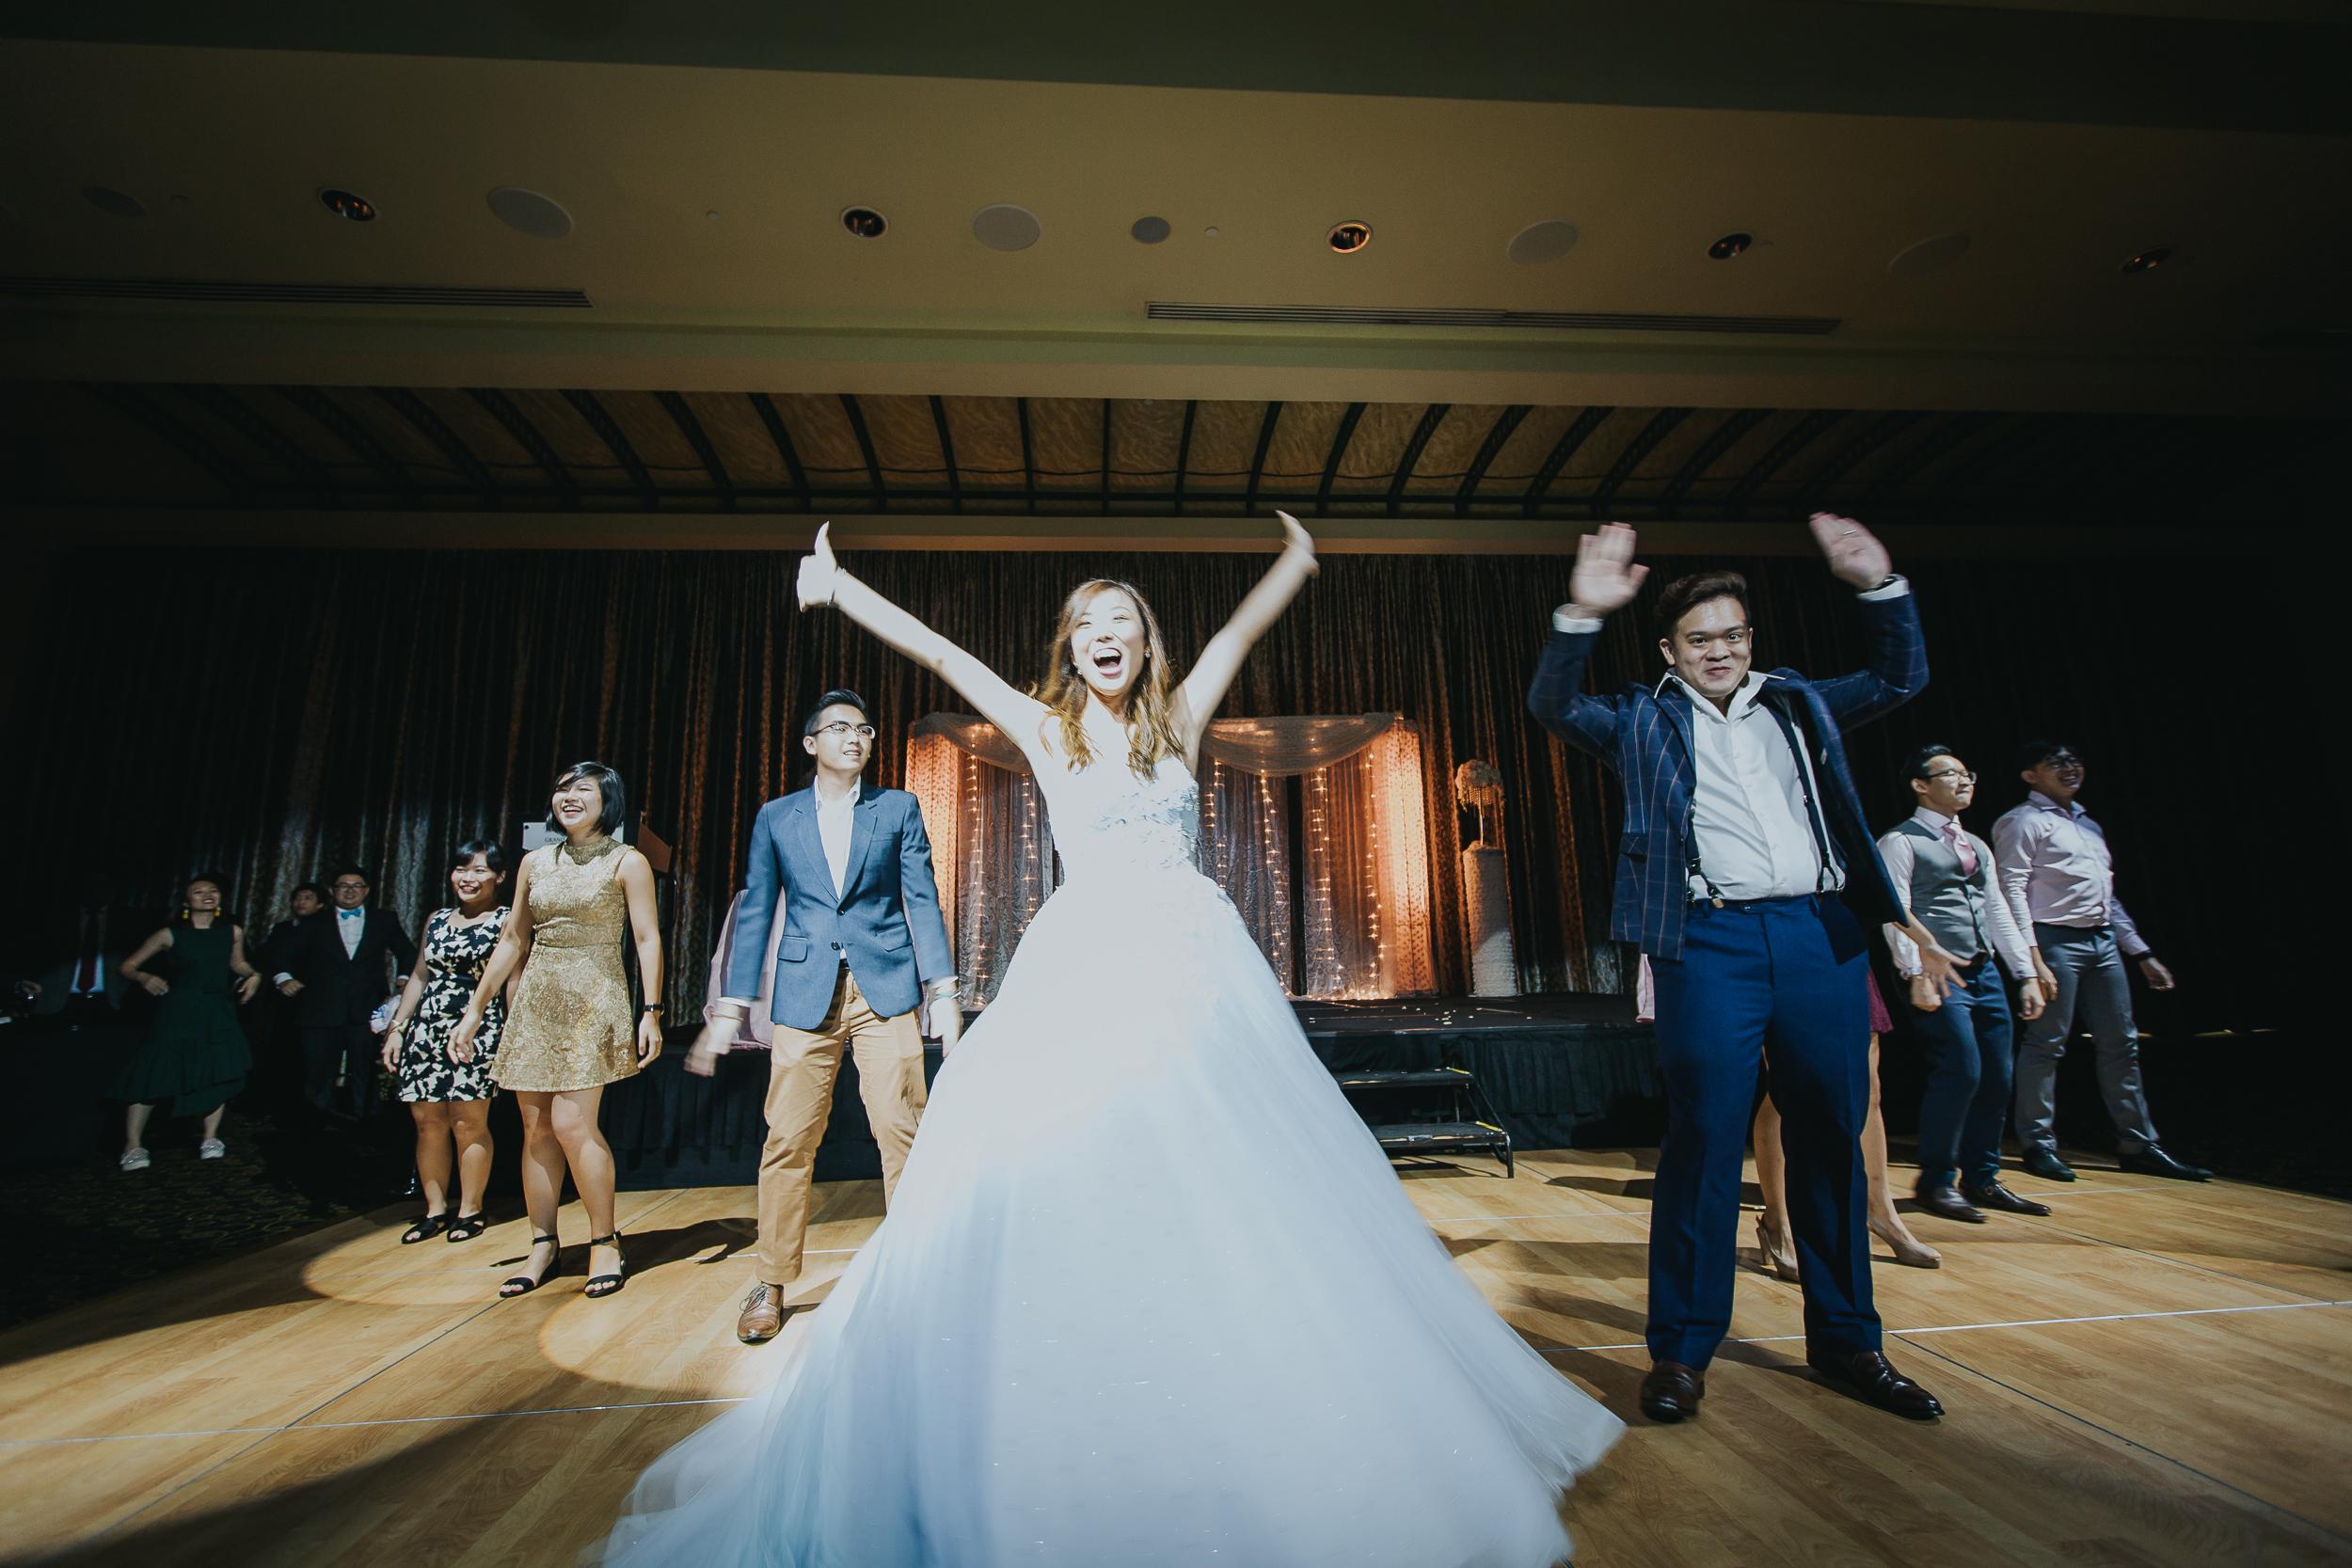 Singapore+Actual+Day+Wedding+Photographer+Grand+Mercure+Oliver+Estelle-0121.jpg